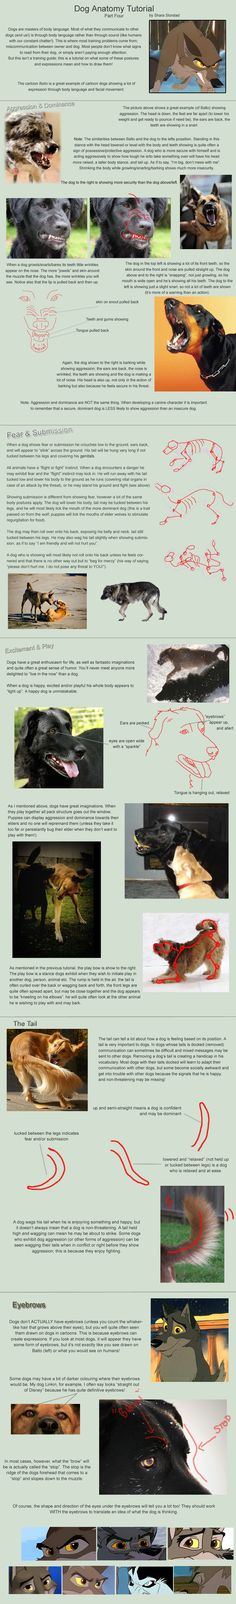 dog anatomy tutorial 4 by sleepingdeadgirl deviantart com on deviantart